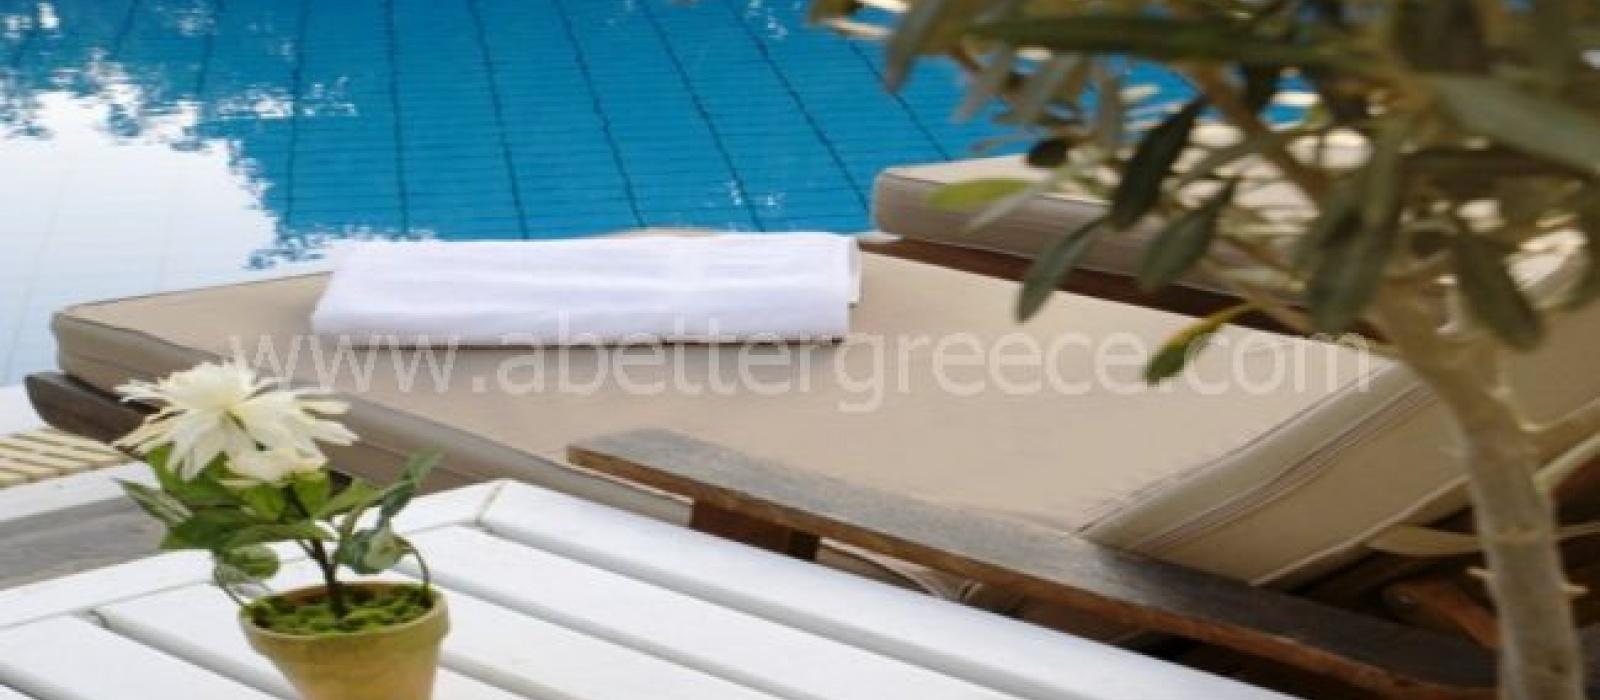 1 Bedrooms, Apartment, Vacation Rental, 1 Bathrooms, Listing ID 1198, Mykonos, Greece,